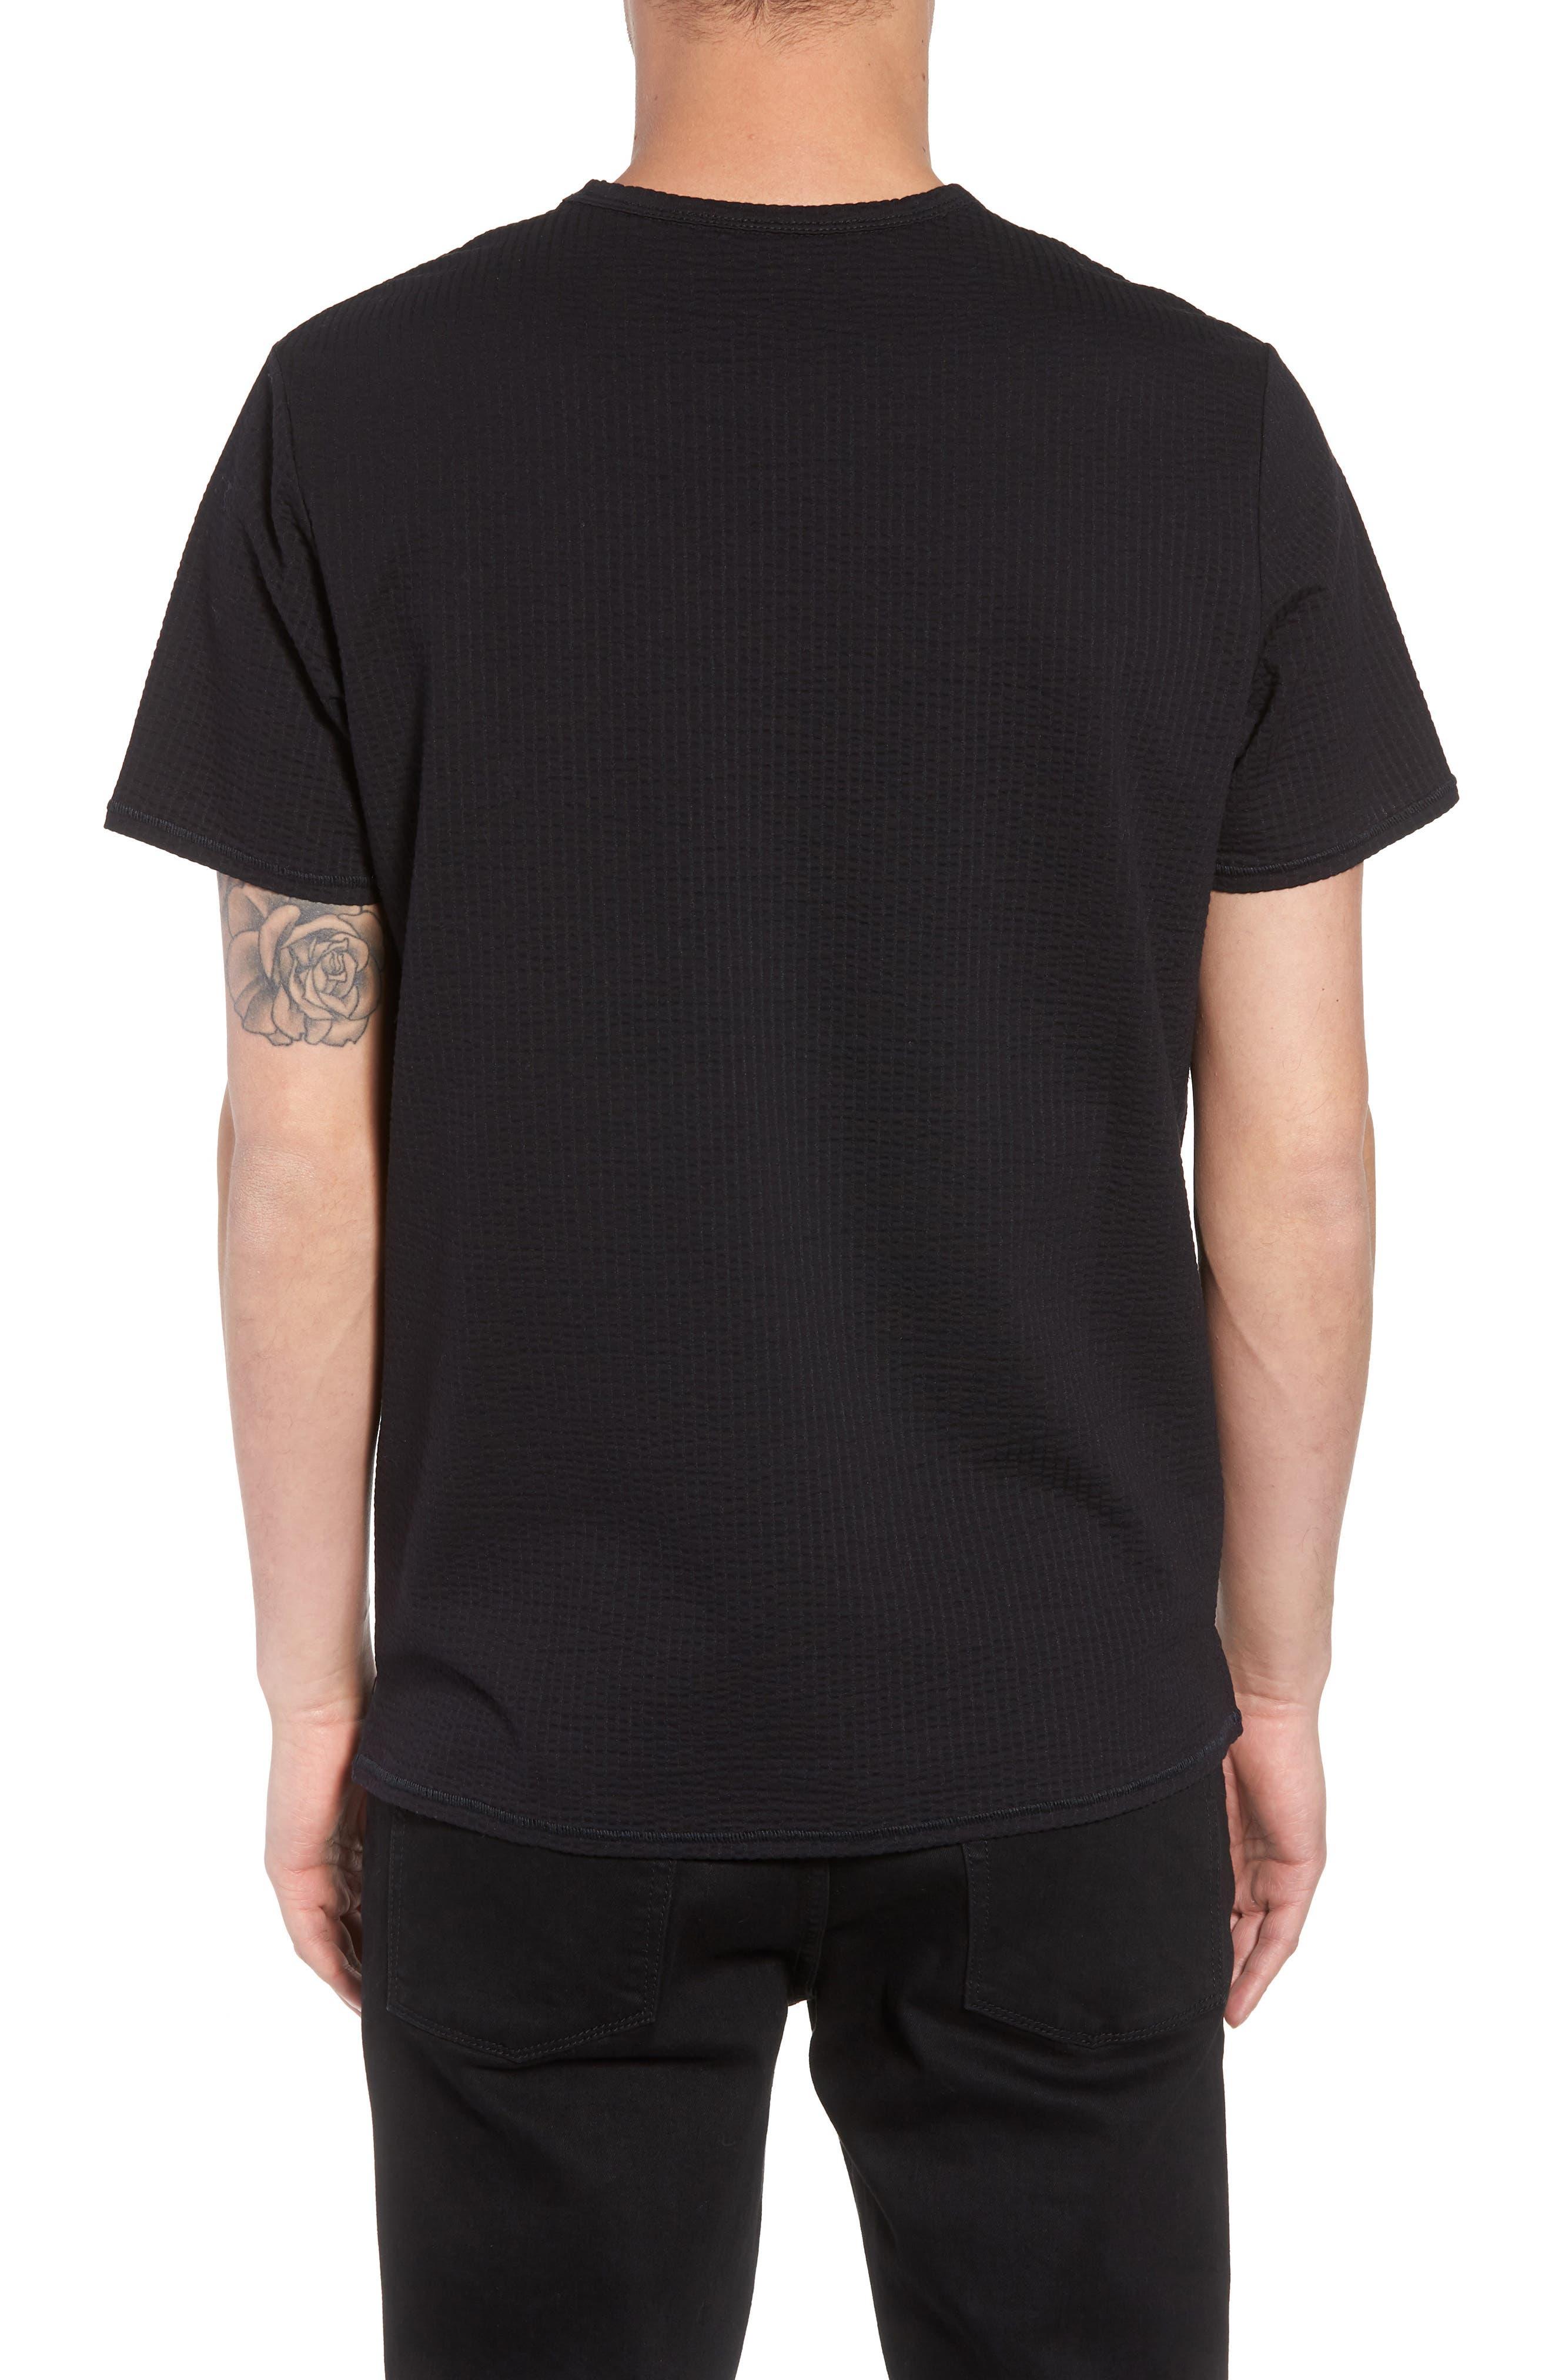 Japanese Seersucker T-Shirt,                             Alternate thumbnail 2, color,                             Black Seersucker